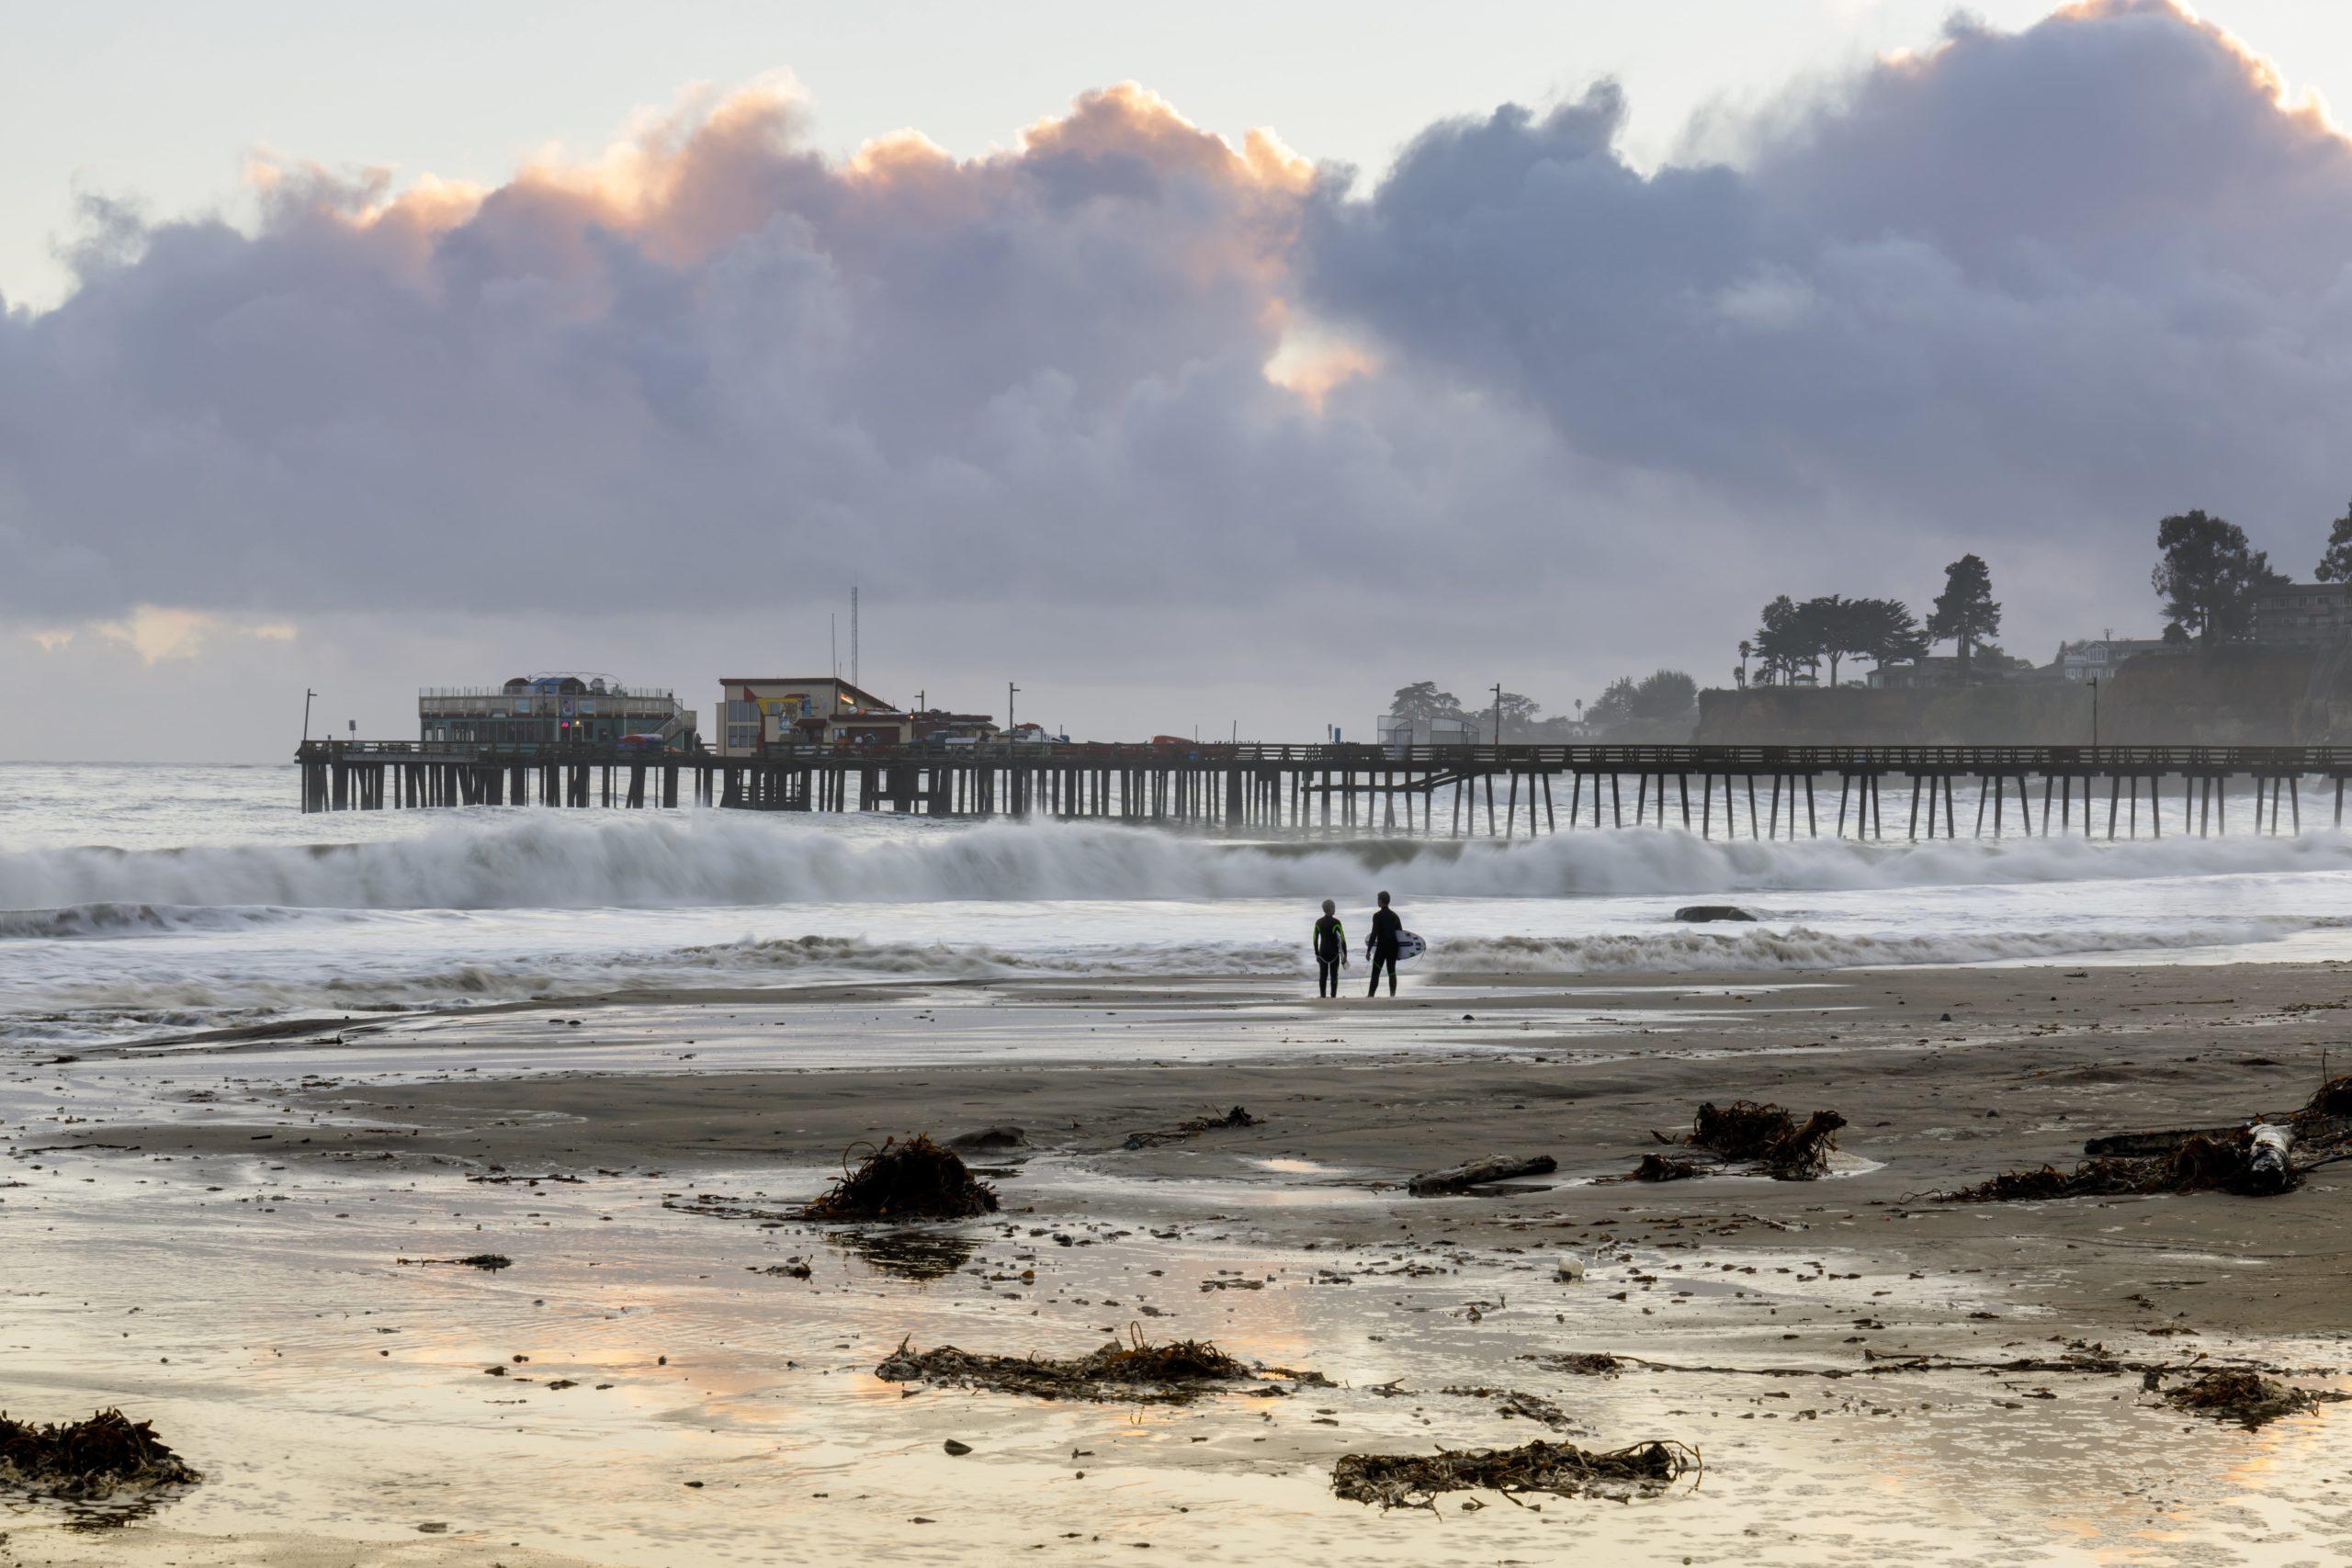 Surfing Santa Cruz - Cowells Beach